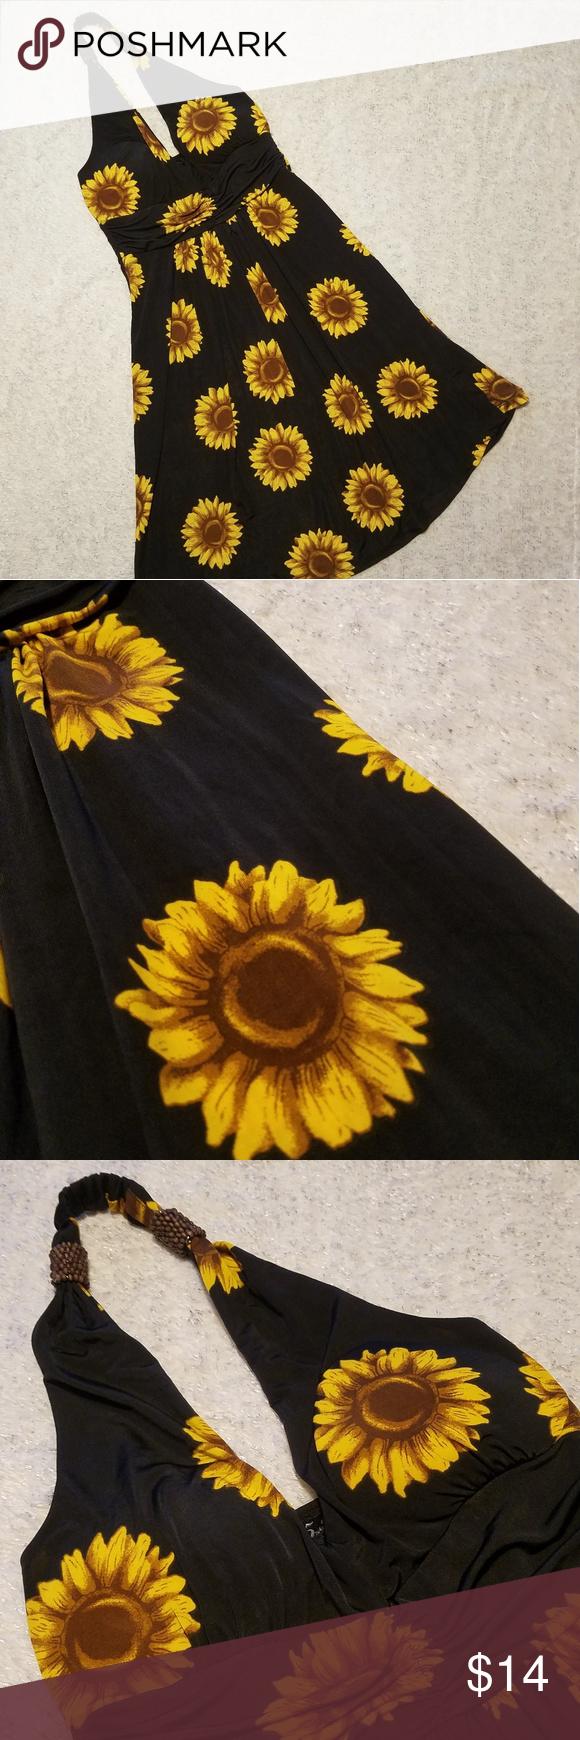 Sunflower Floral Print Halter Dress Trendy Dresses Summer Casual Dresses Trendy Dresses [ 1740 x 580 Pixel ]